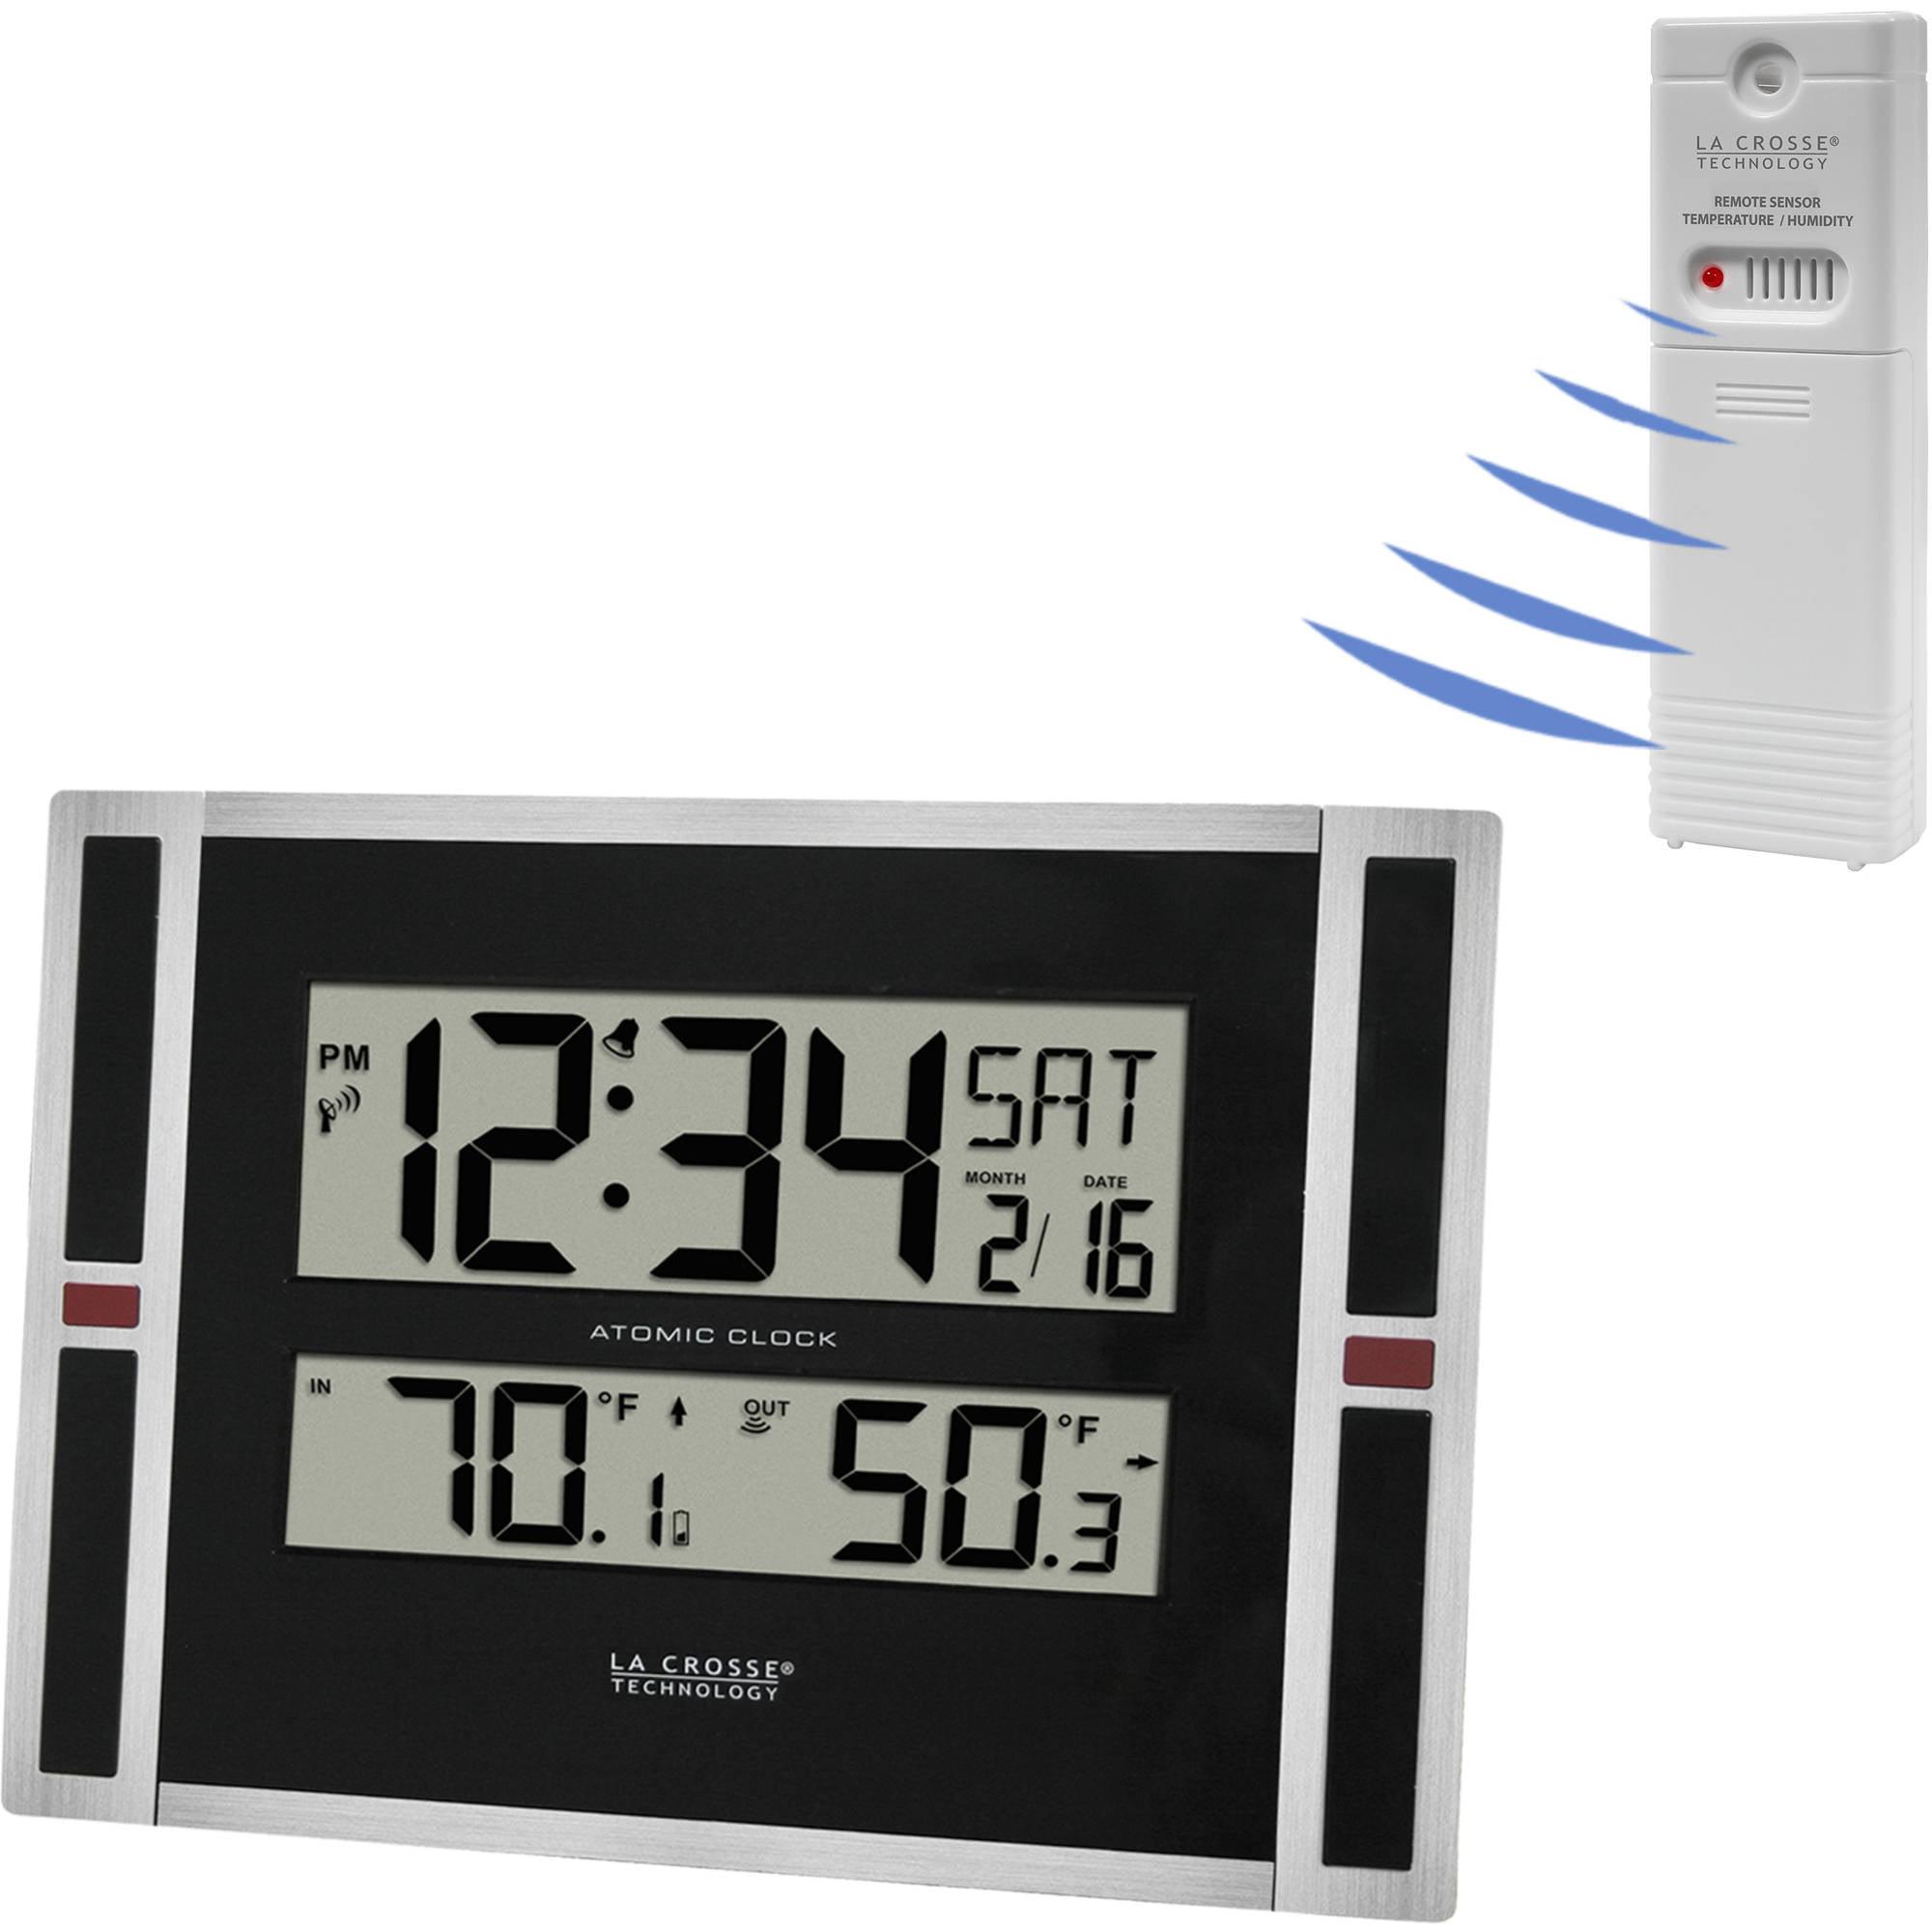 "La Crosse Technology 11"" WWVB Digital Clock with Temperature"